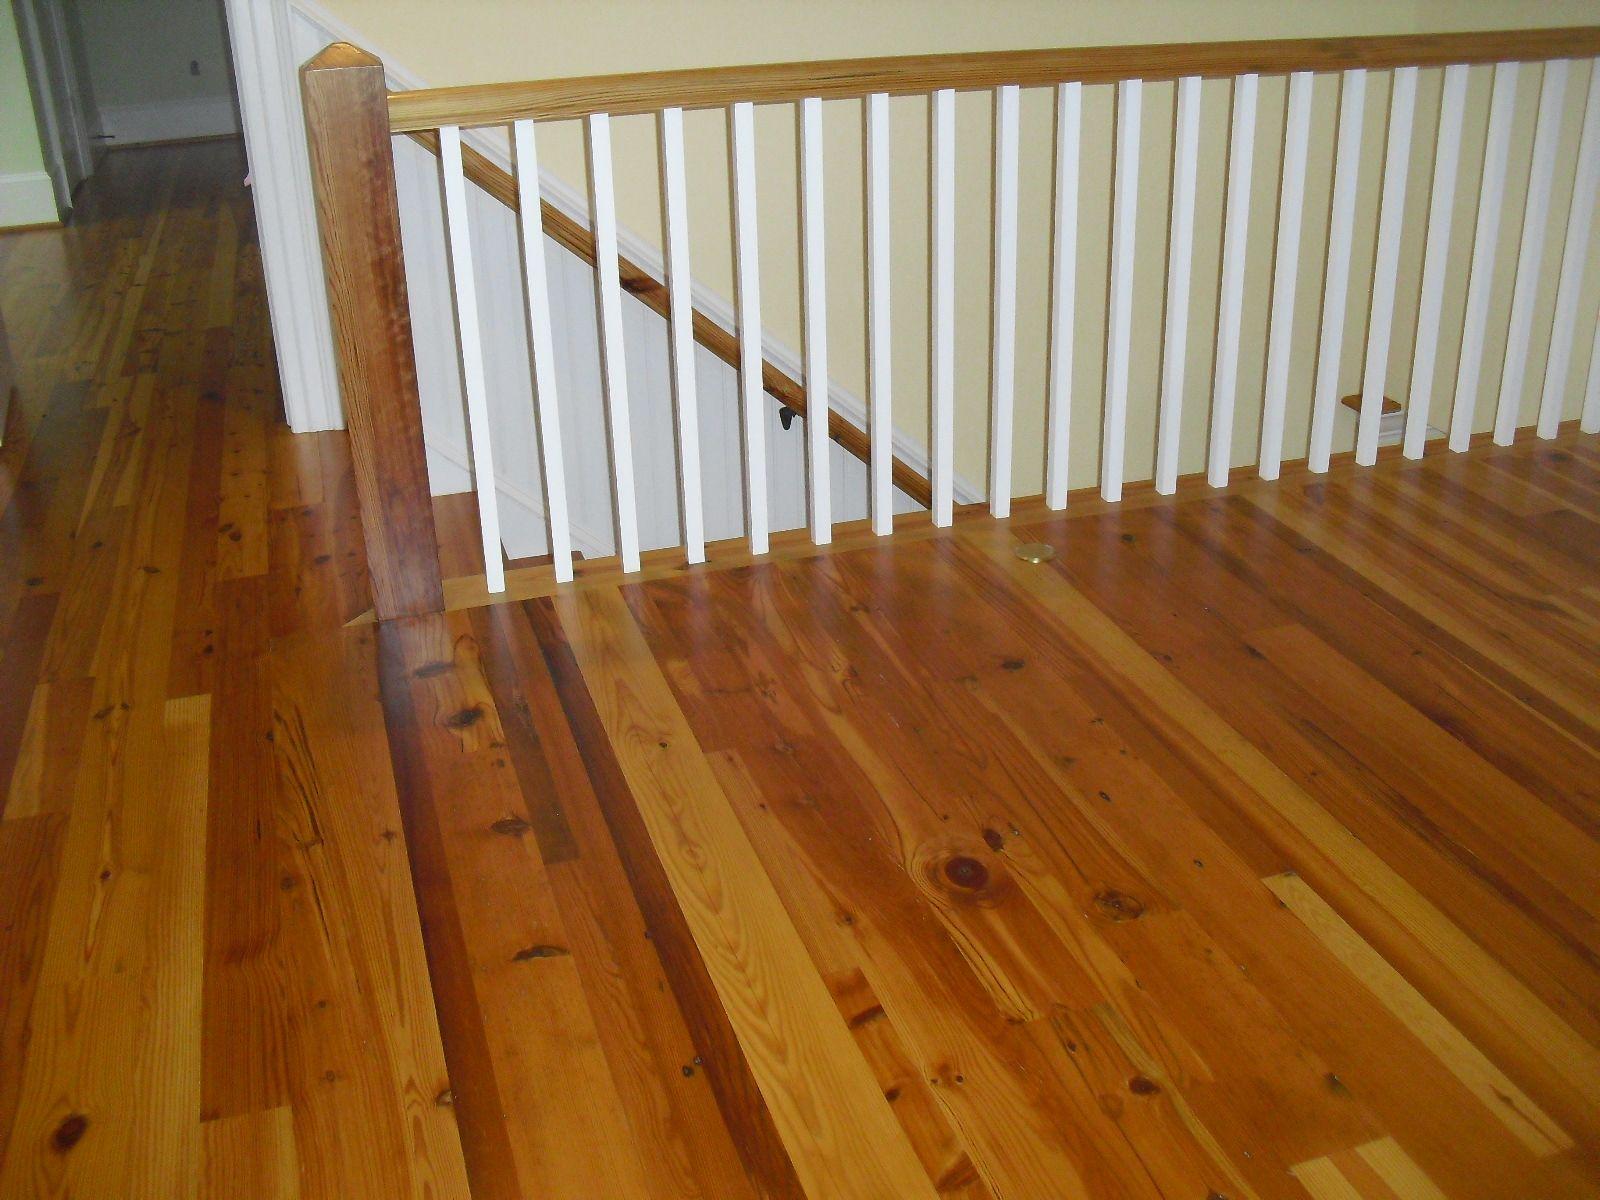 Flooring, Handrails & Newell Post  -Olde Point  -OldGrowthRiverwood.com